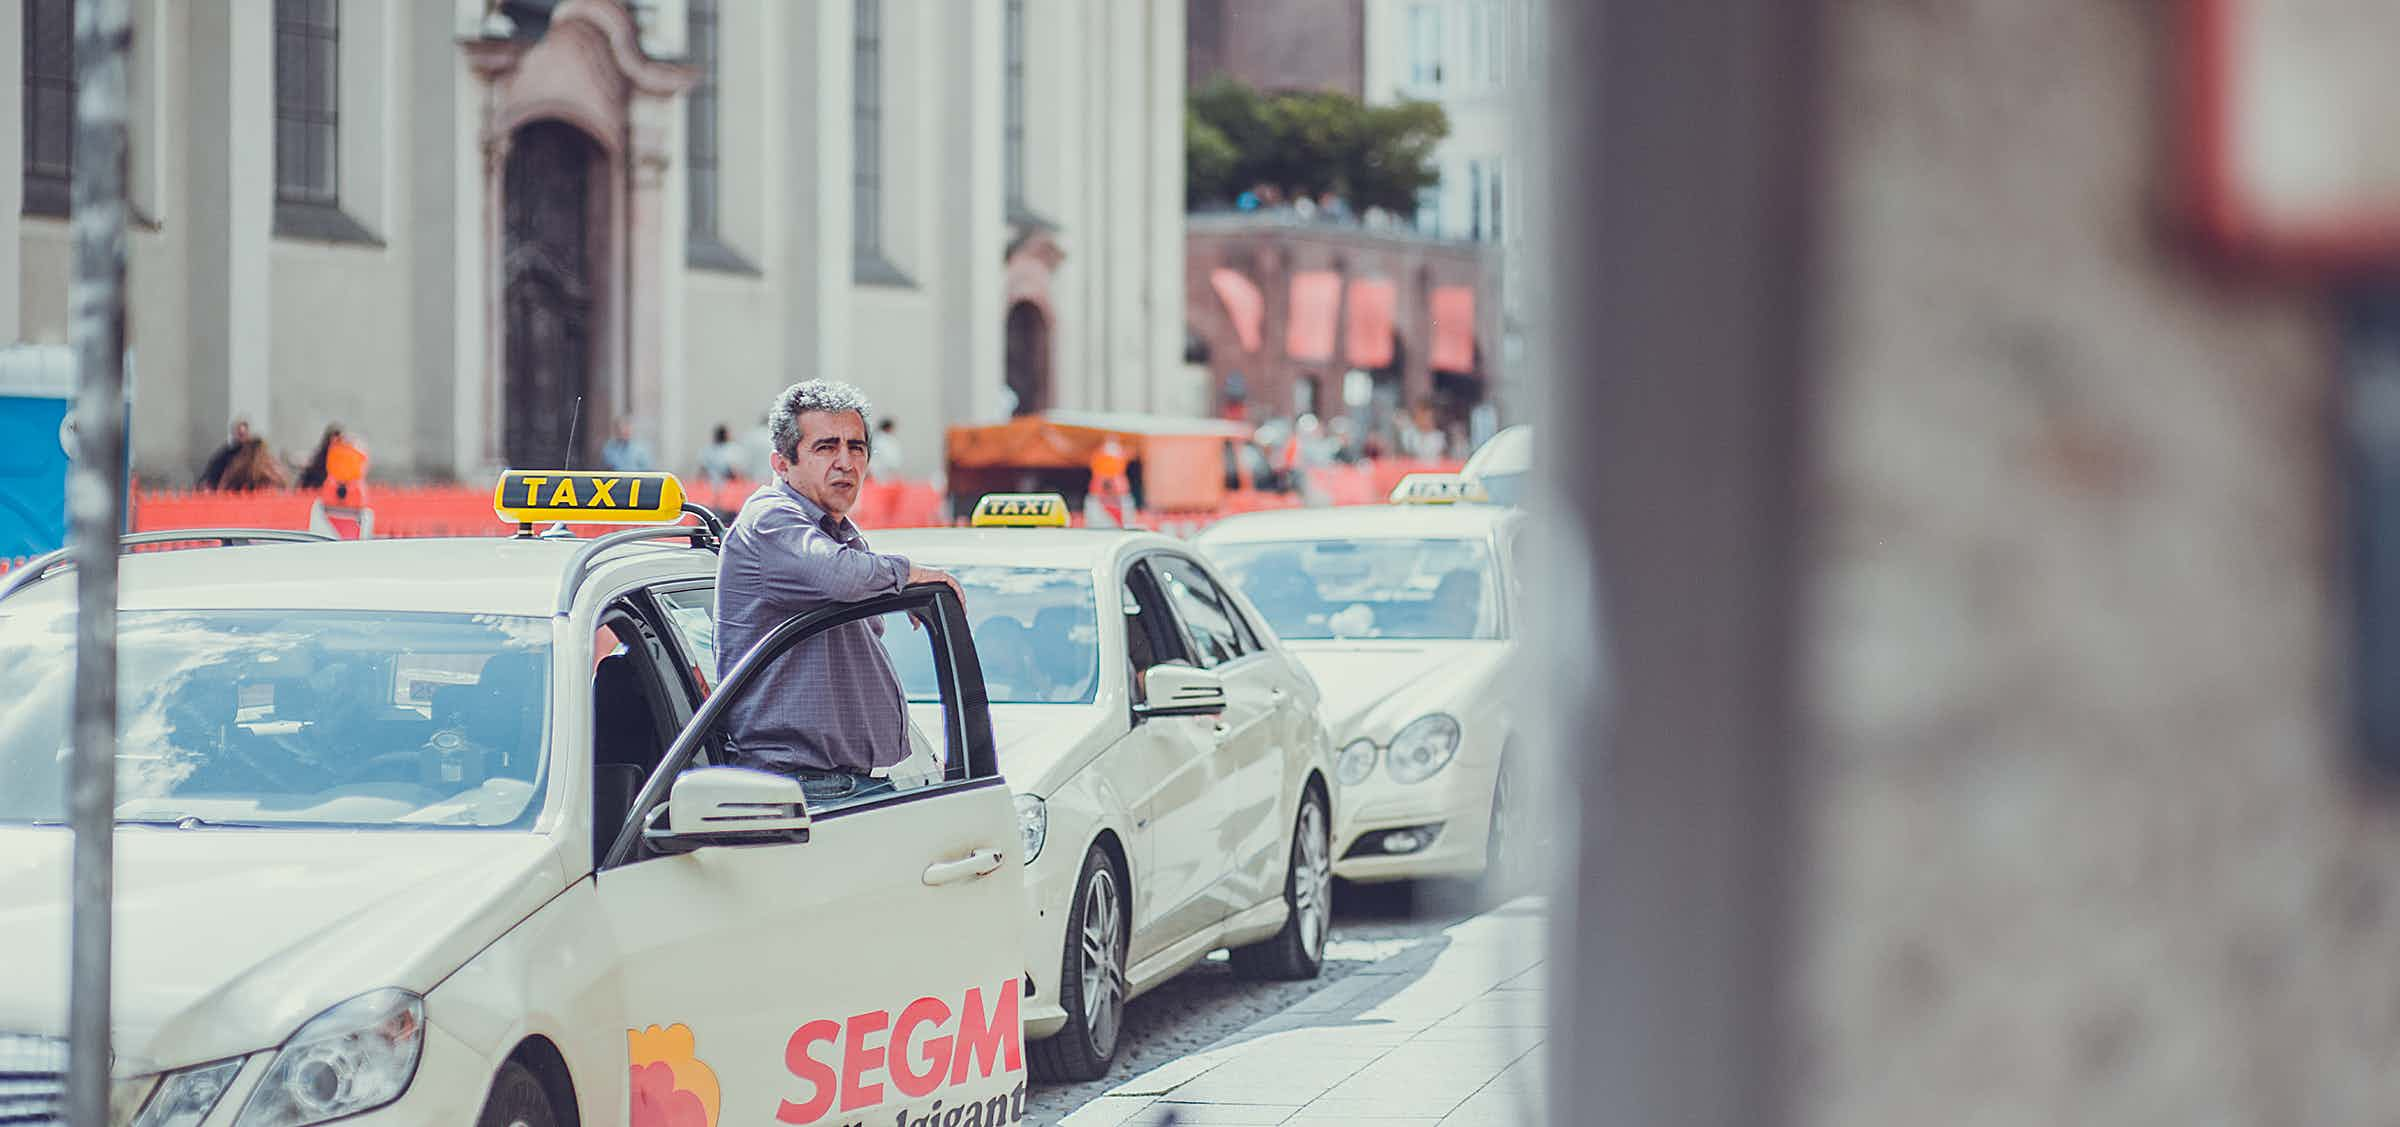 Kassensystem Taxifahrer